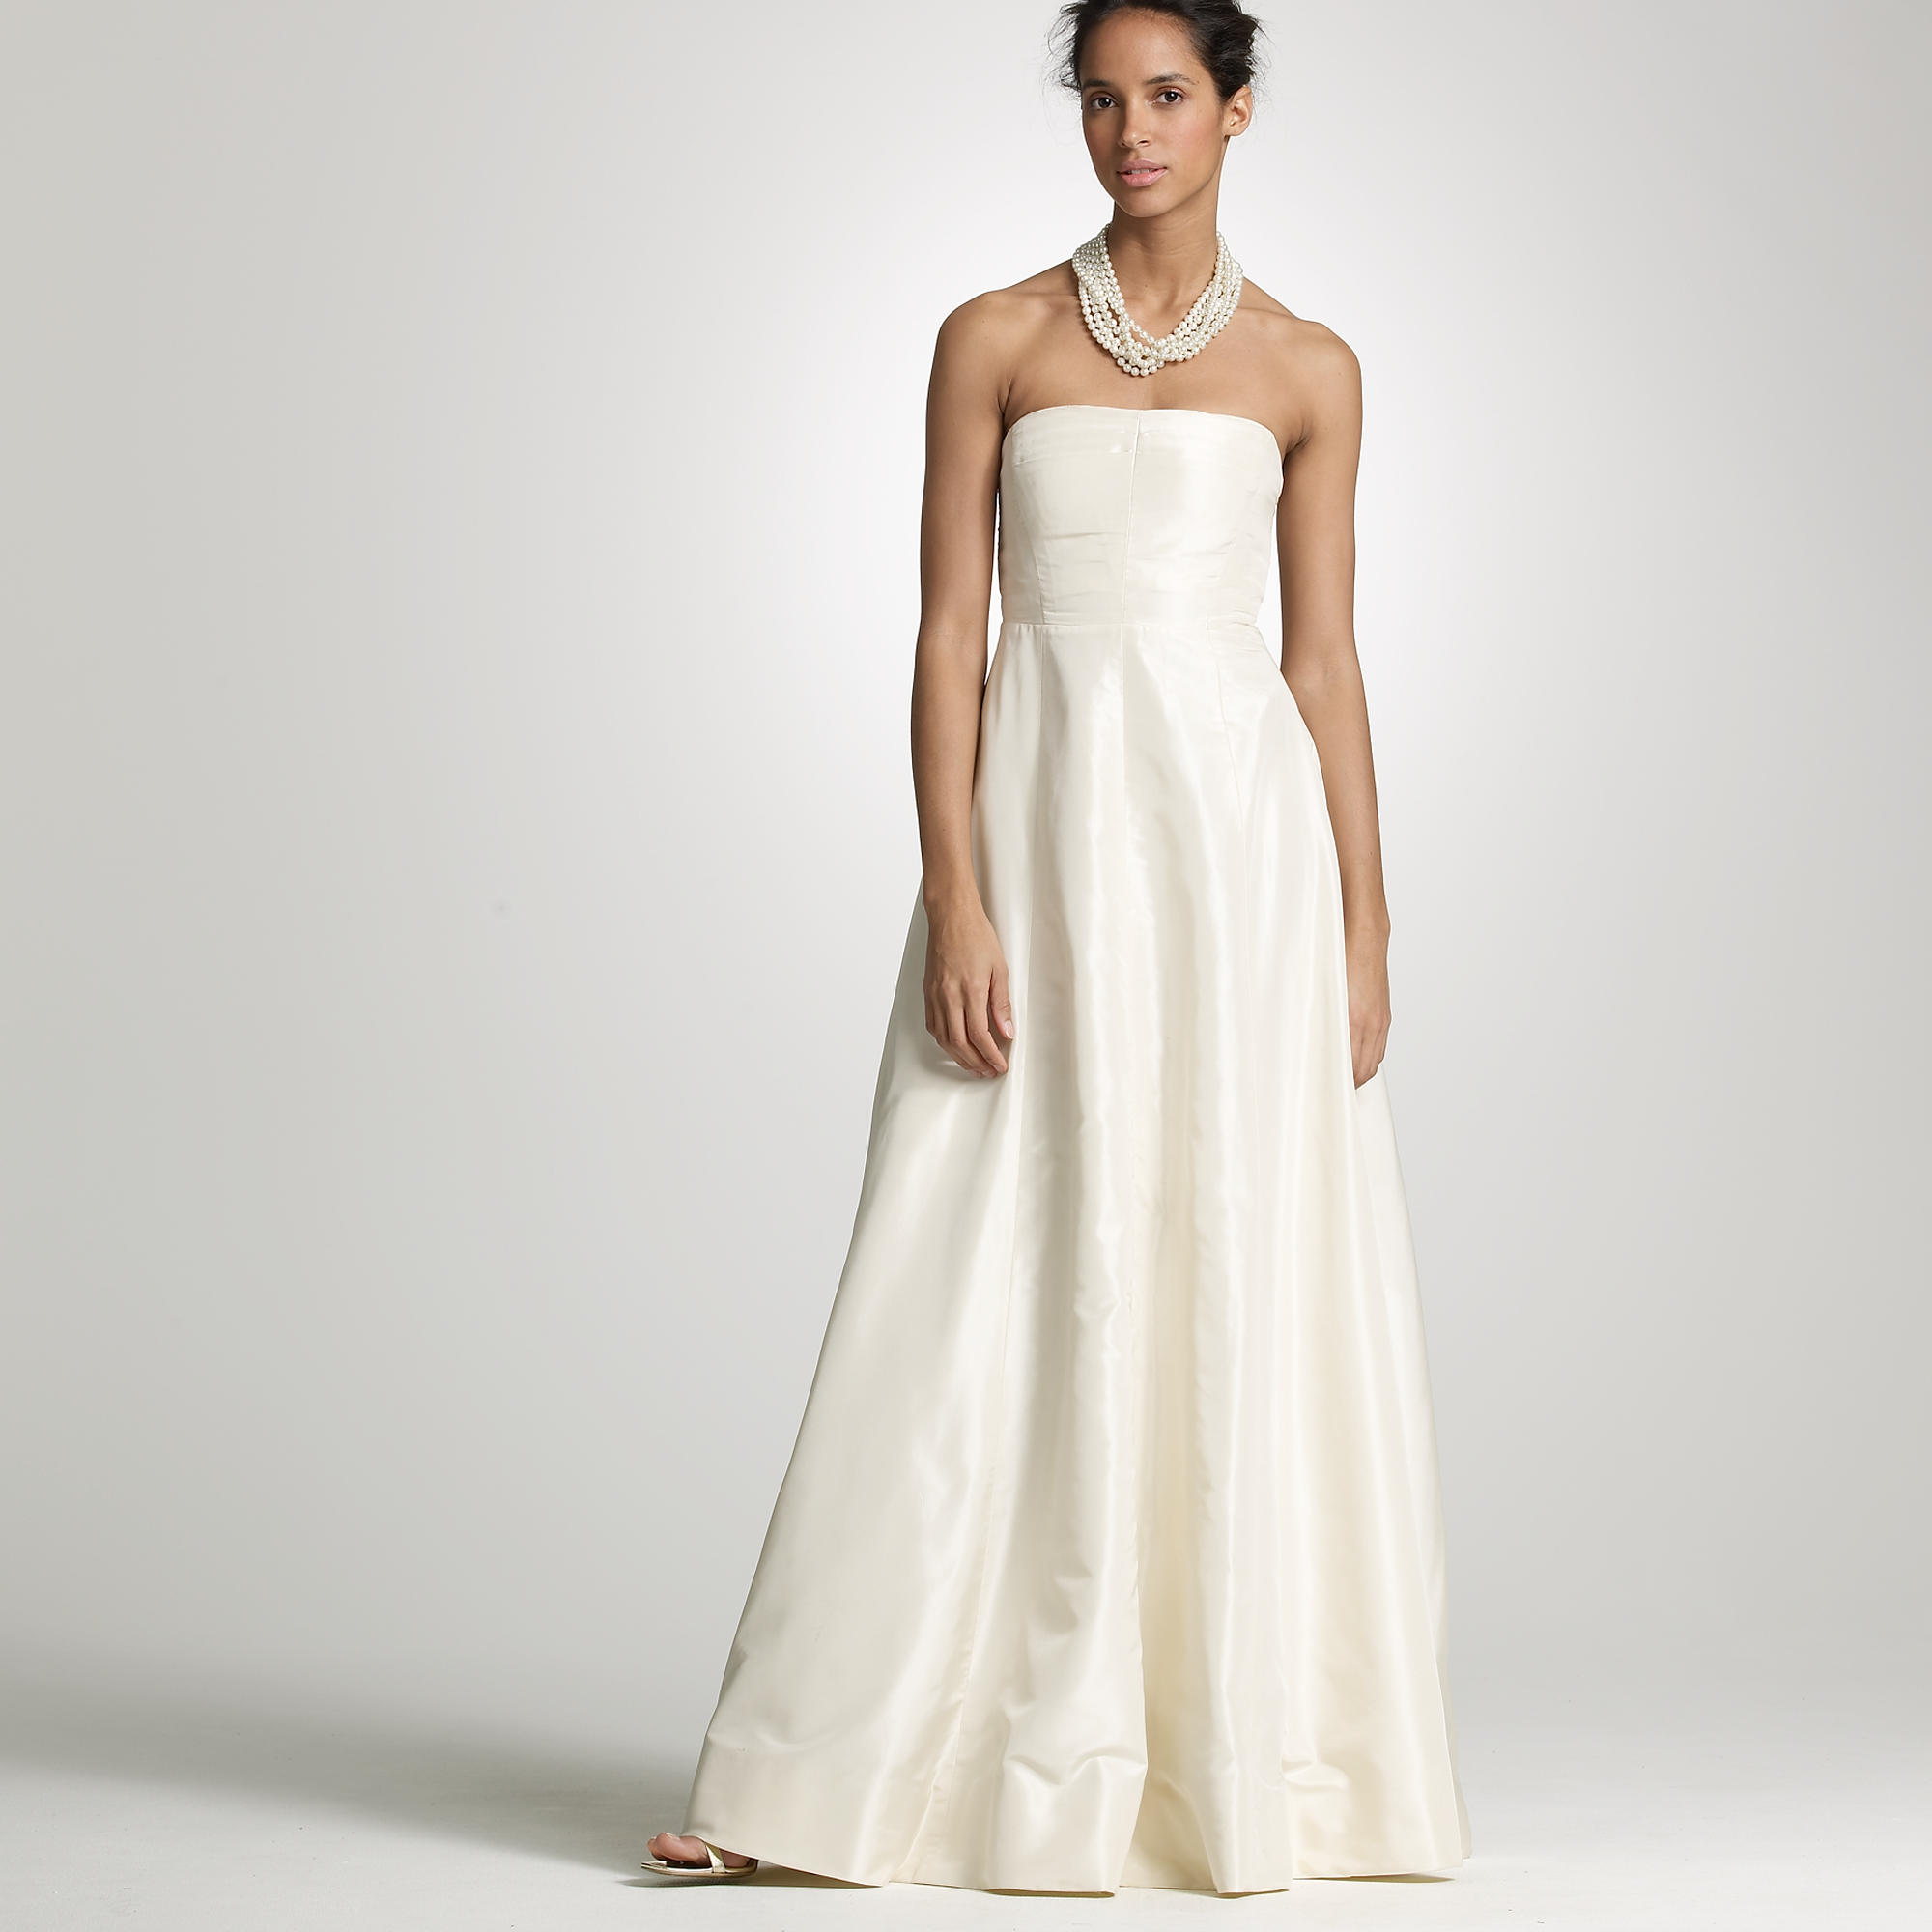 j crew wedding dress Silk taffeta Sabine gown